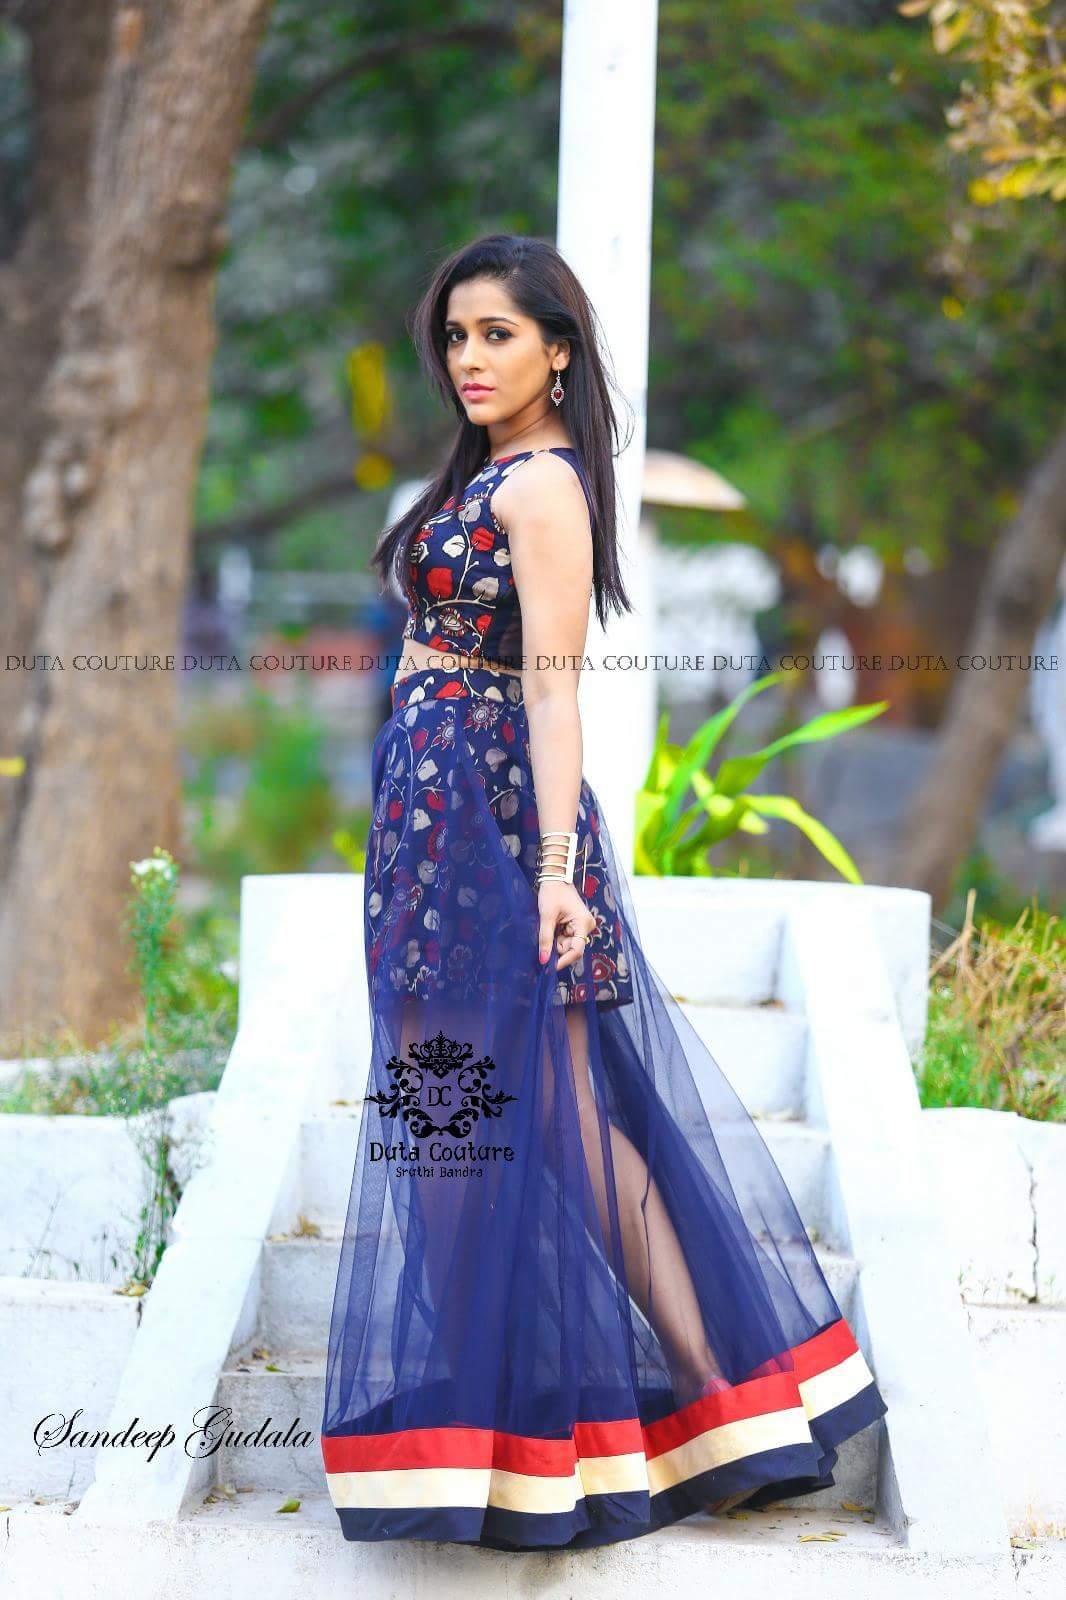 Hot Rashmi Gautam Telugu Film Industry Anchor And Actress -5276